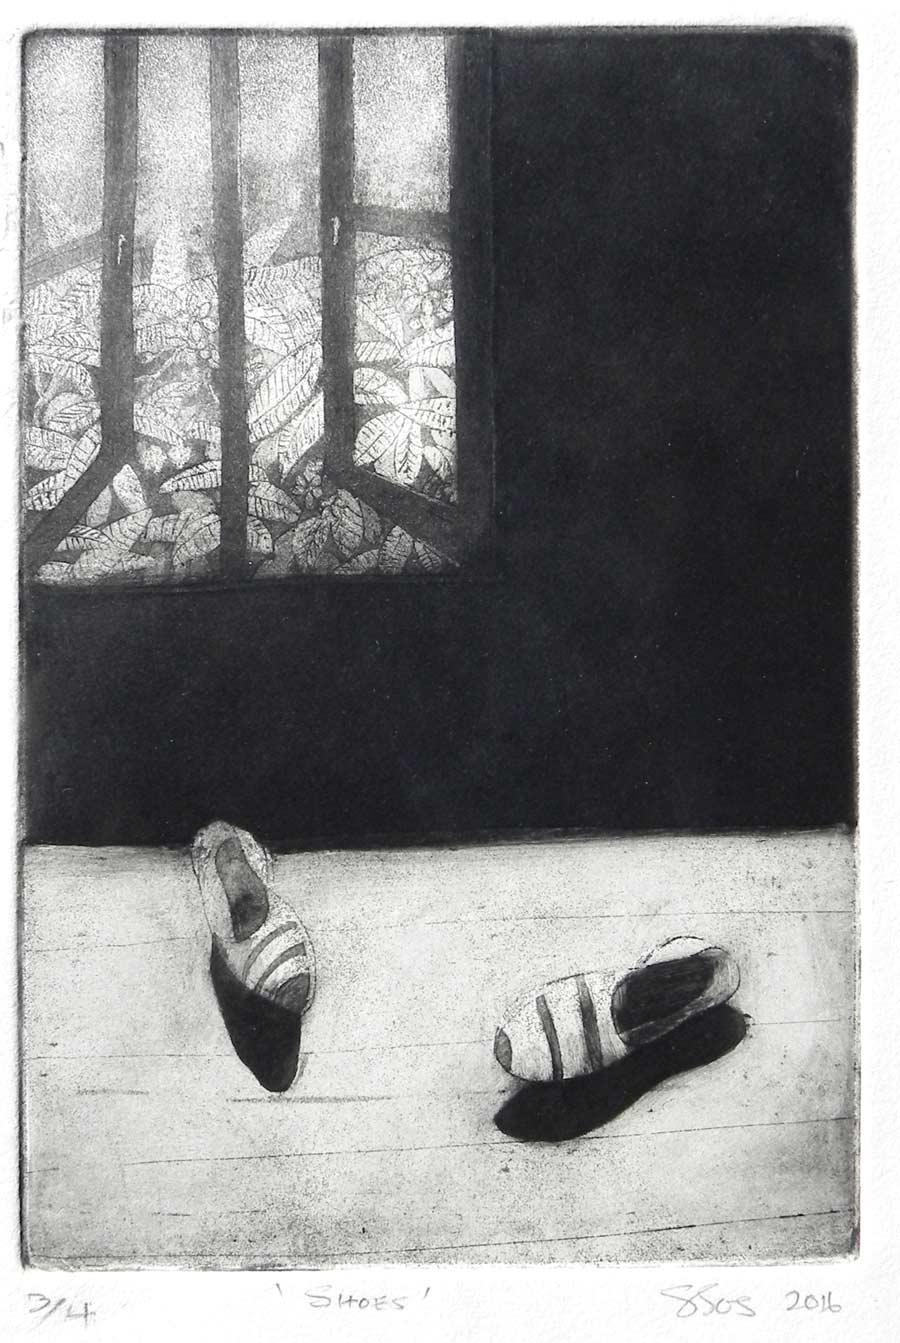 shoes-web900.jpg